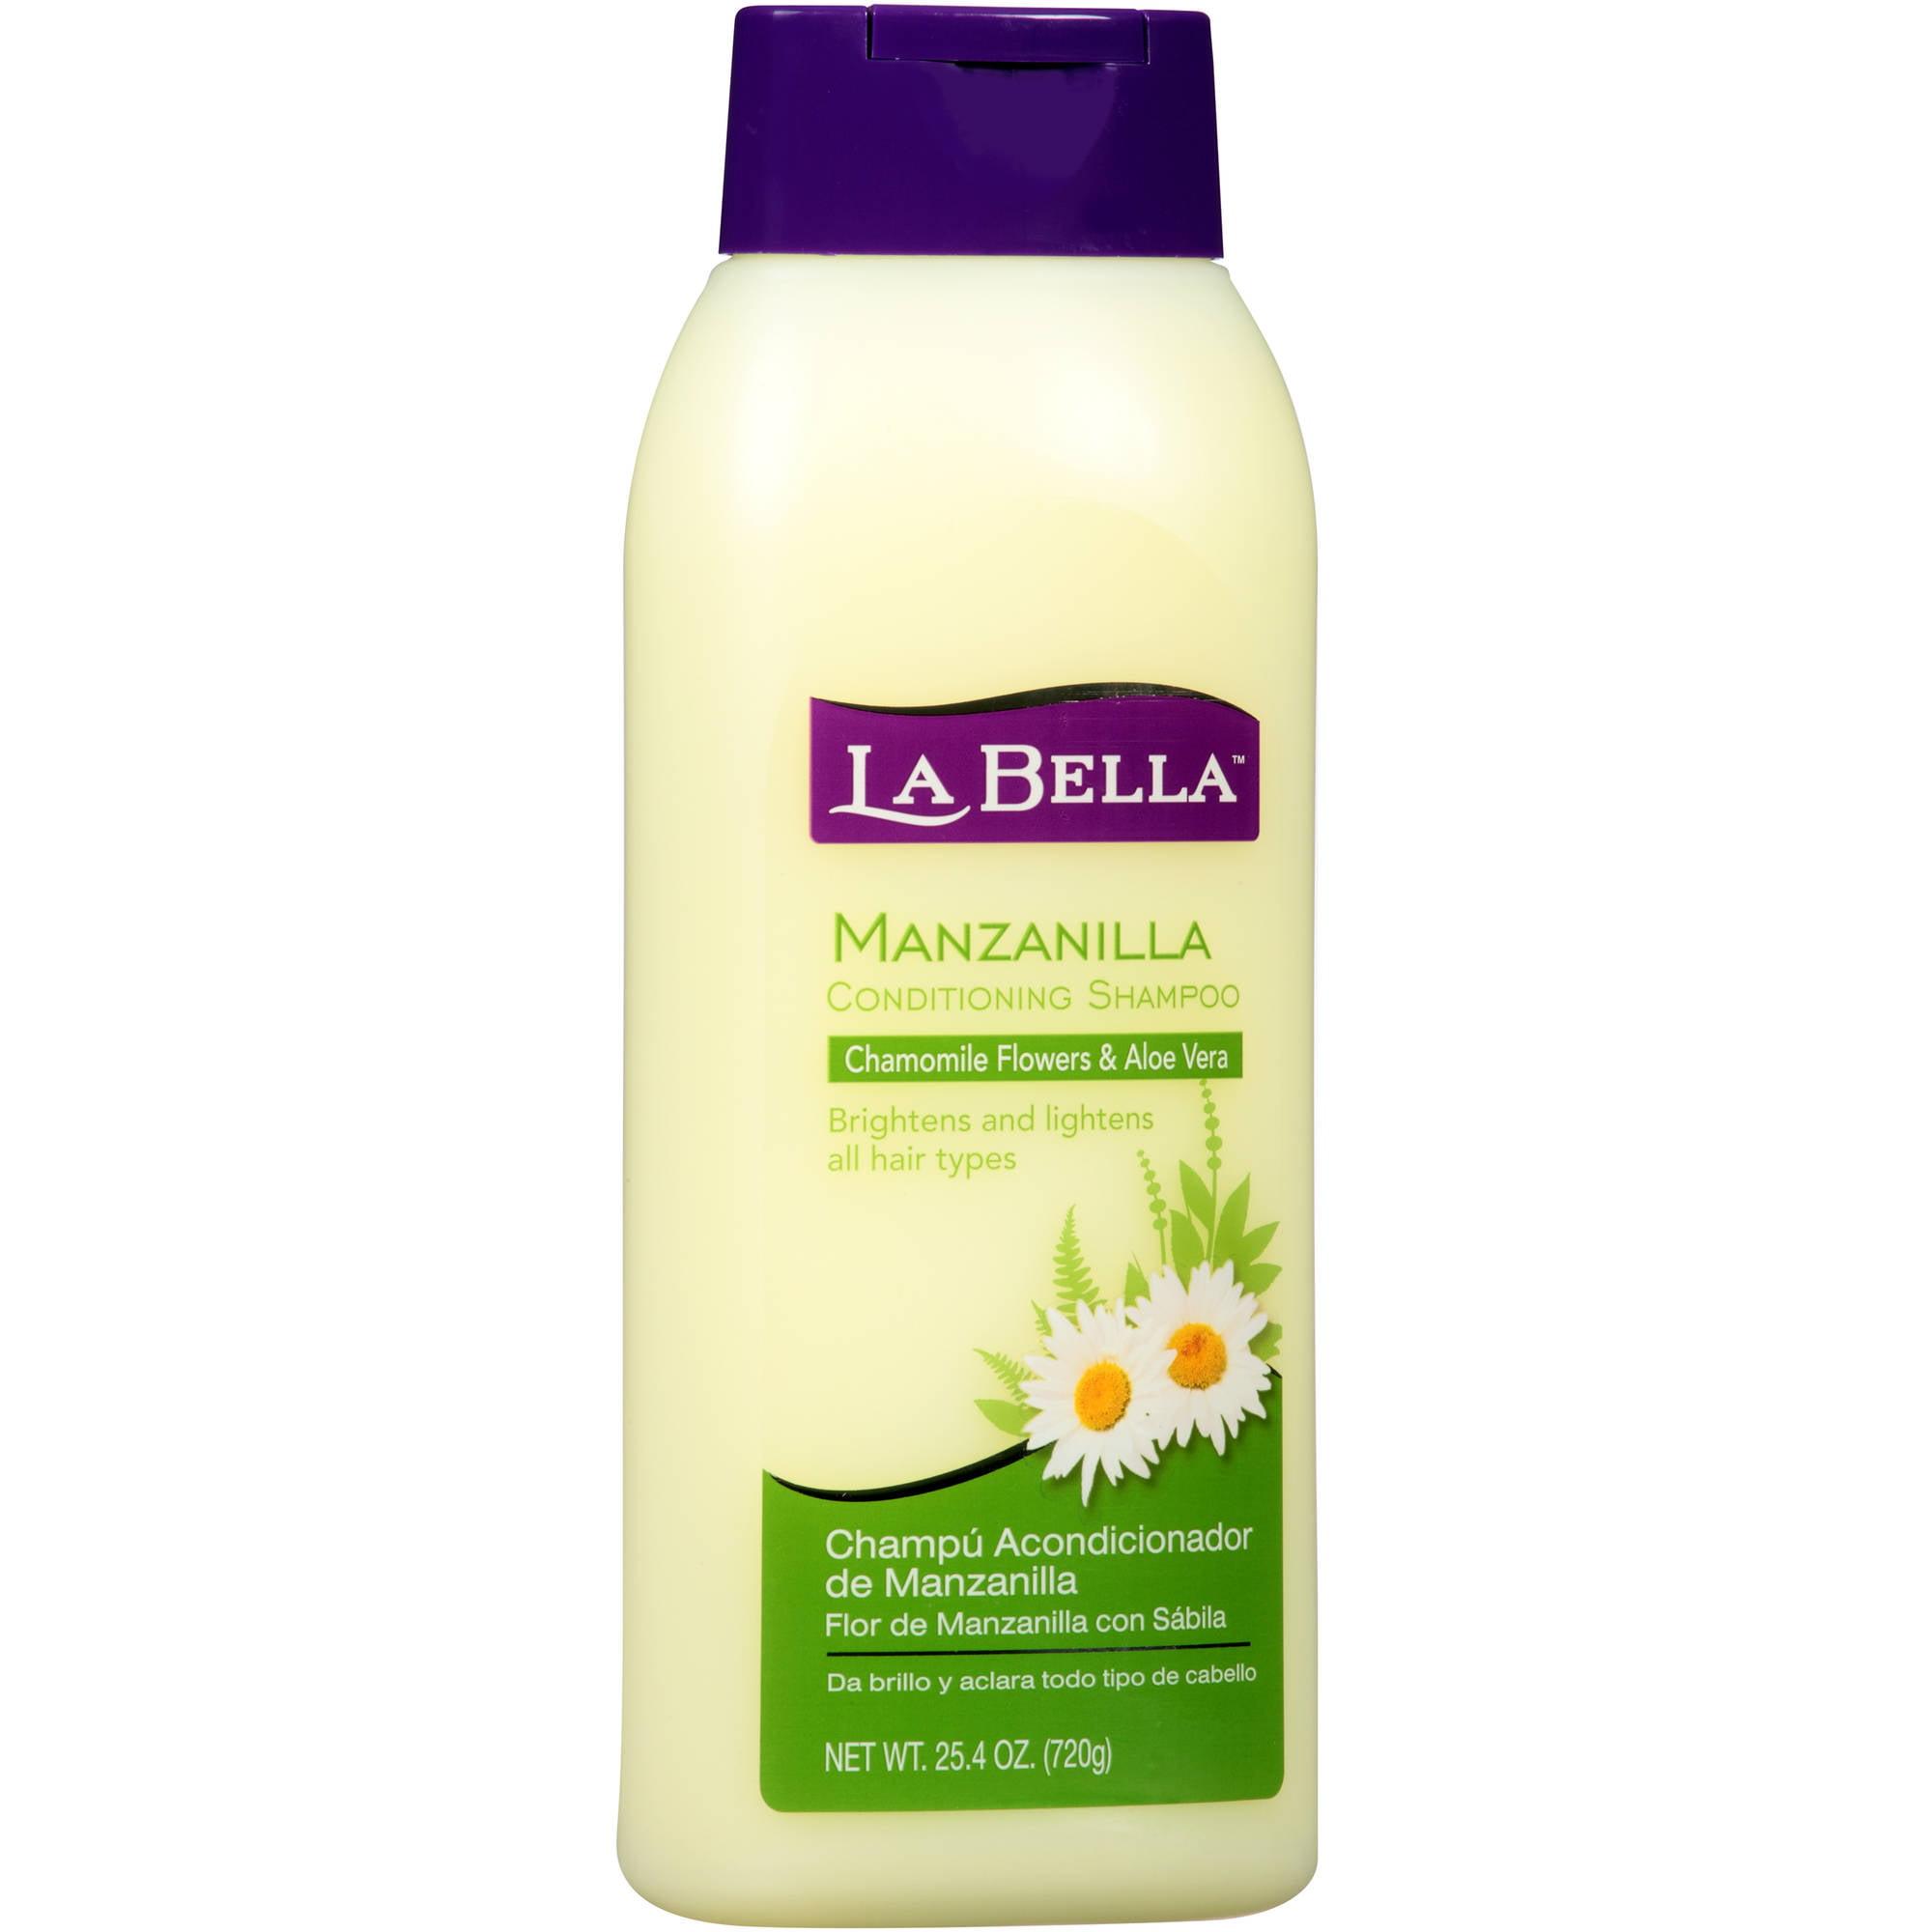 la bella placenta shampoo reviews